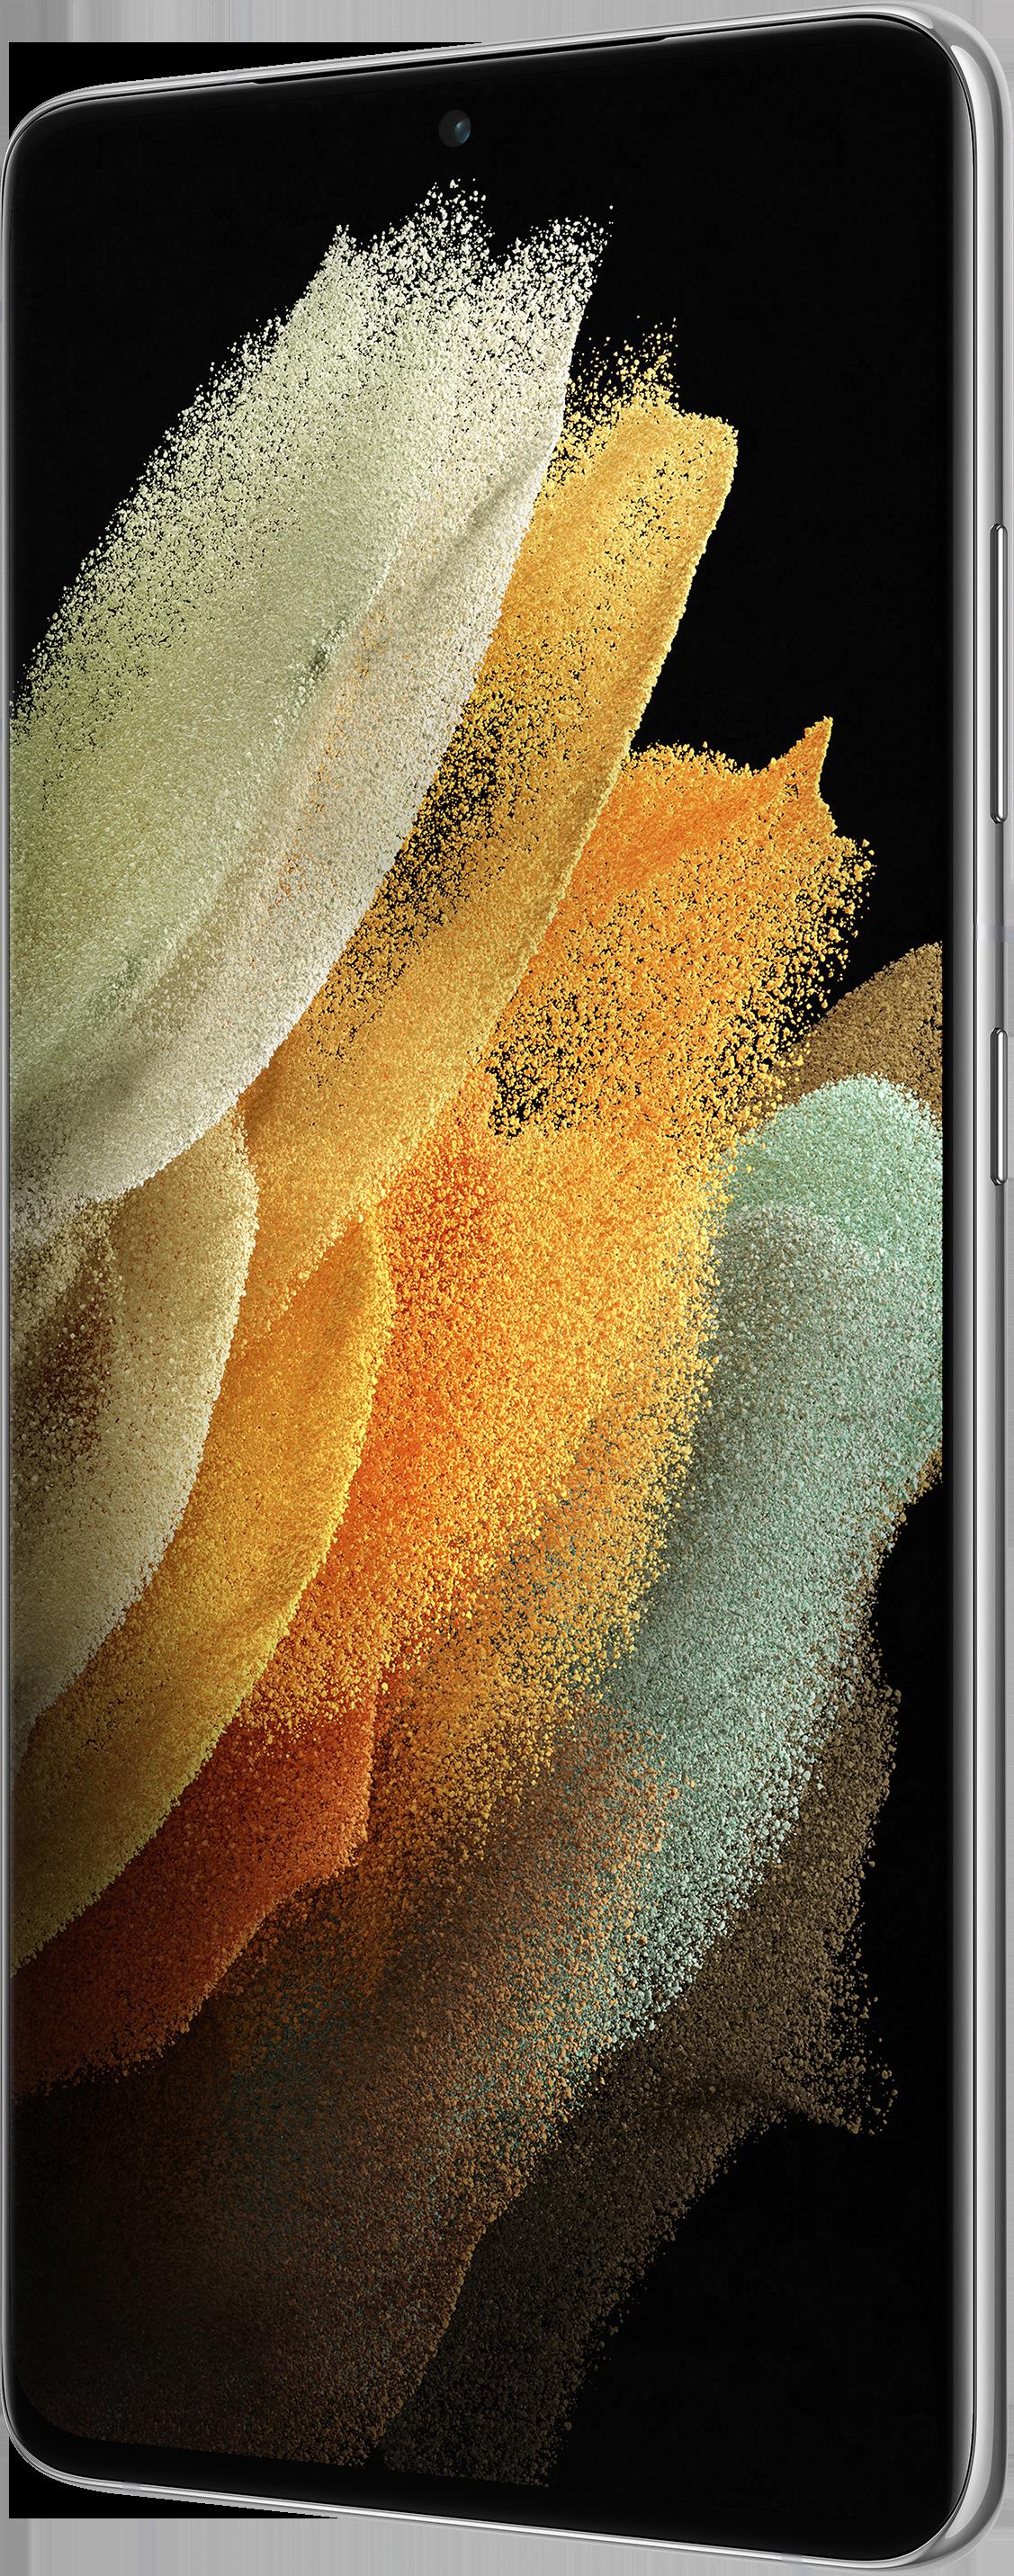 Samsung Smartphone Galaxy S21 Ultra - 128GB - Dual Sim